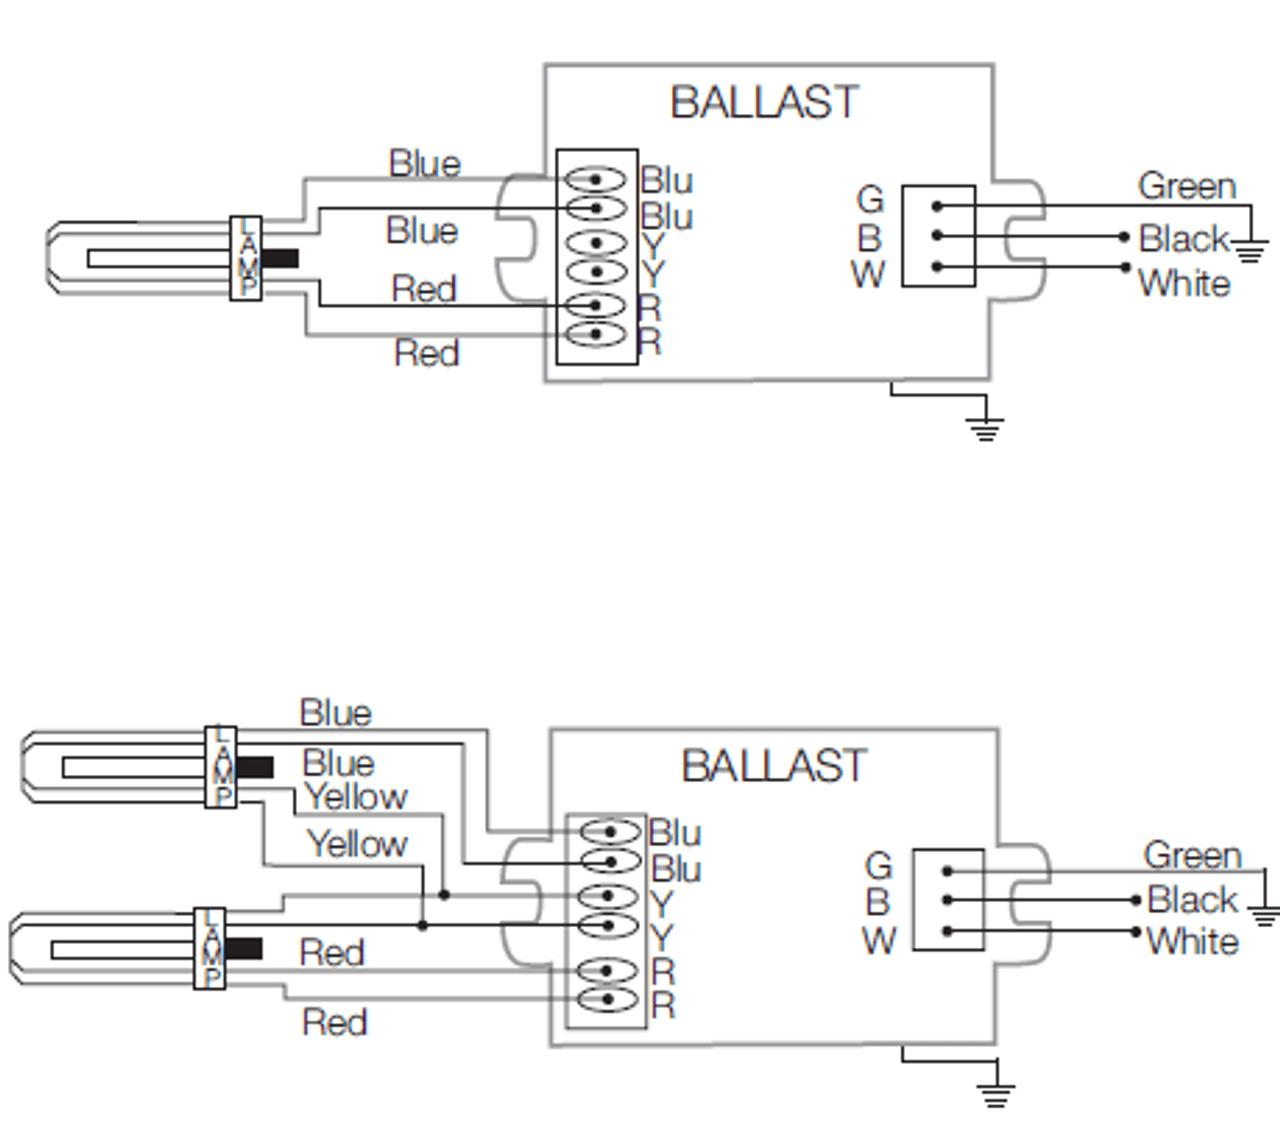 hight resolution of sylvania ballast wiring diagram guide about wiring diagram osram sylvania ballast wiring diagram